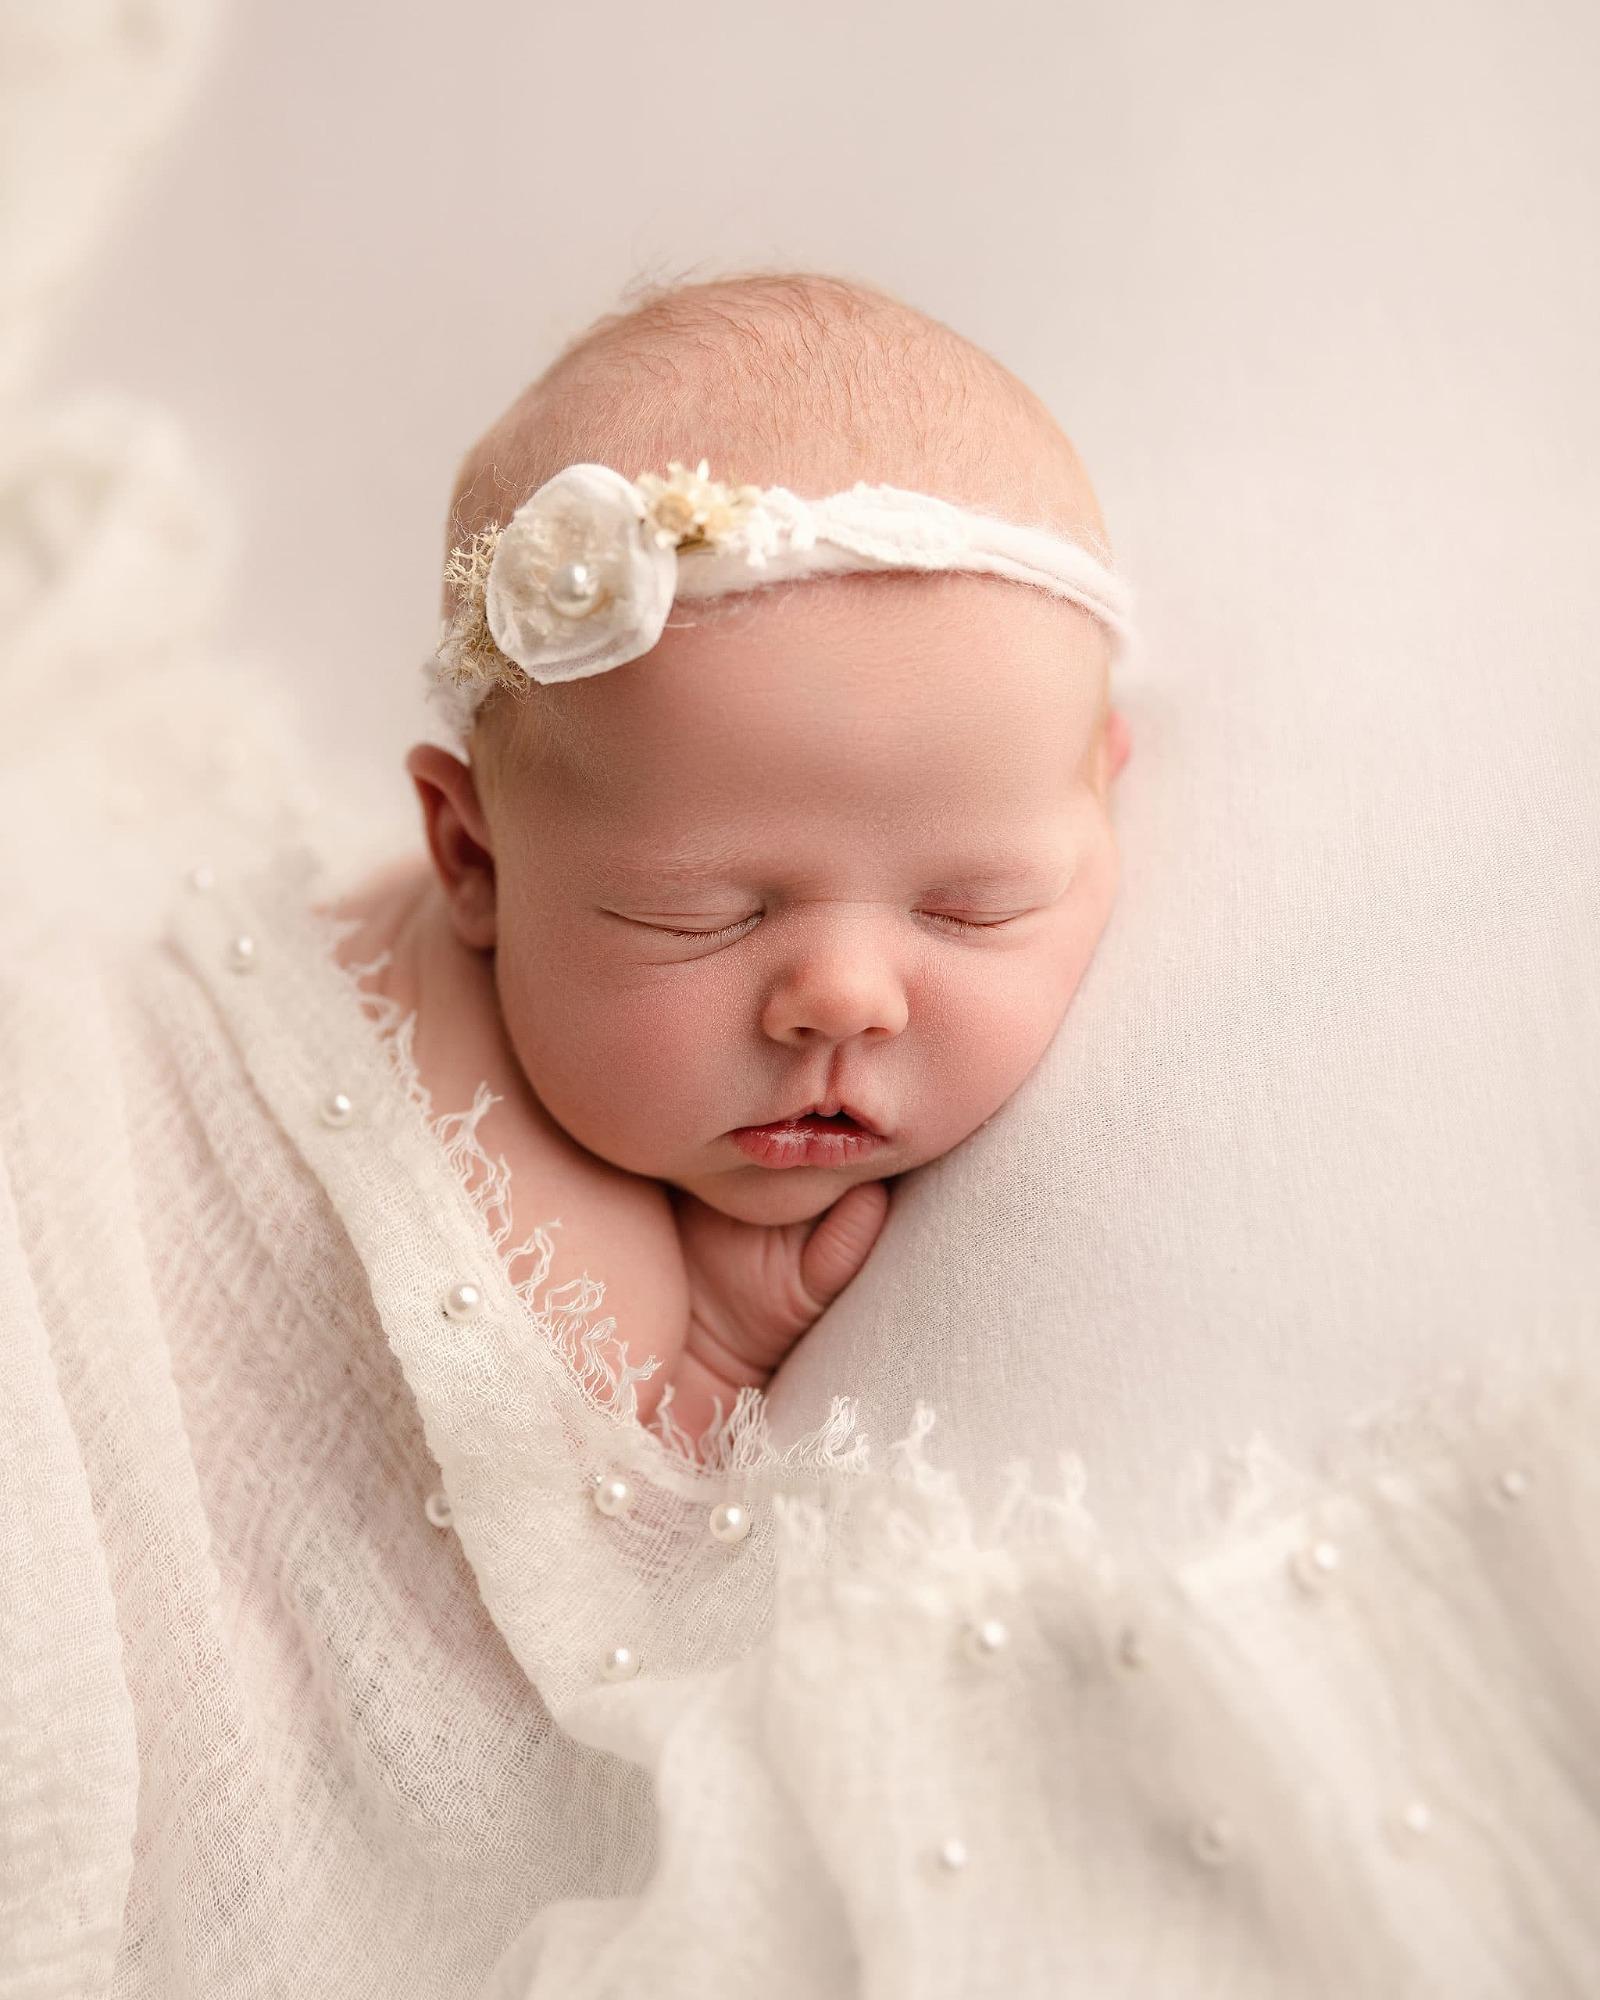 Jemma-Slater-Photography-baby-gIrl